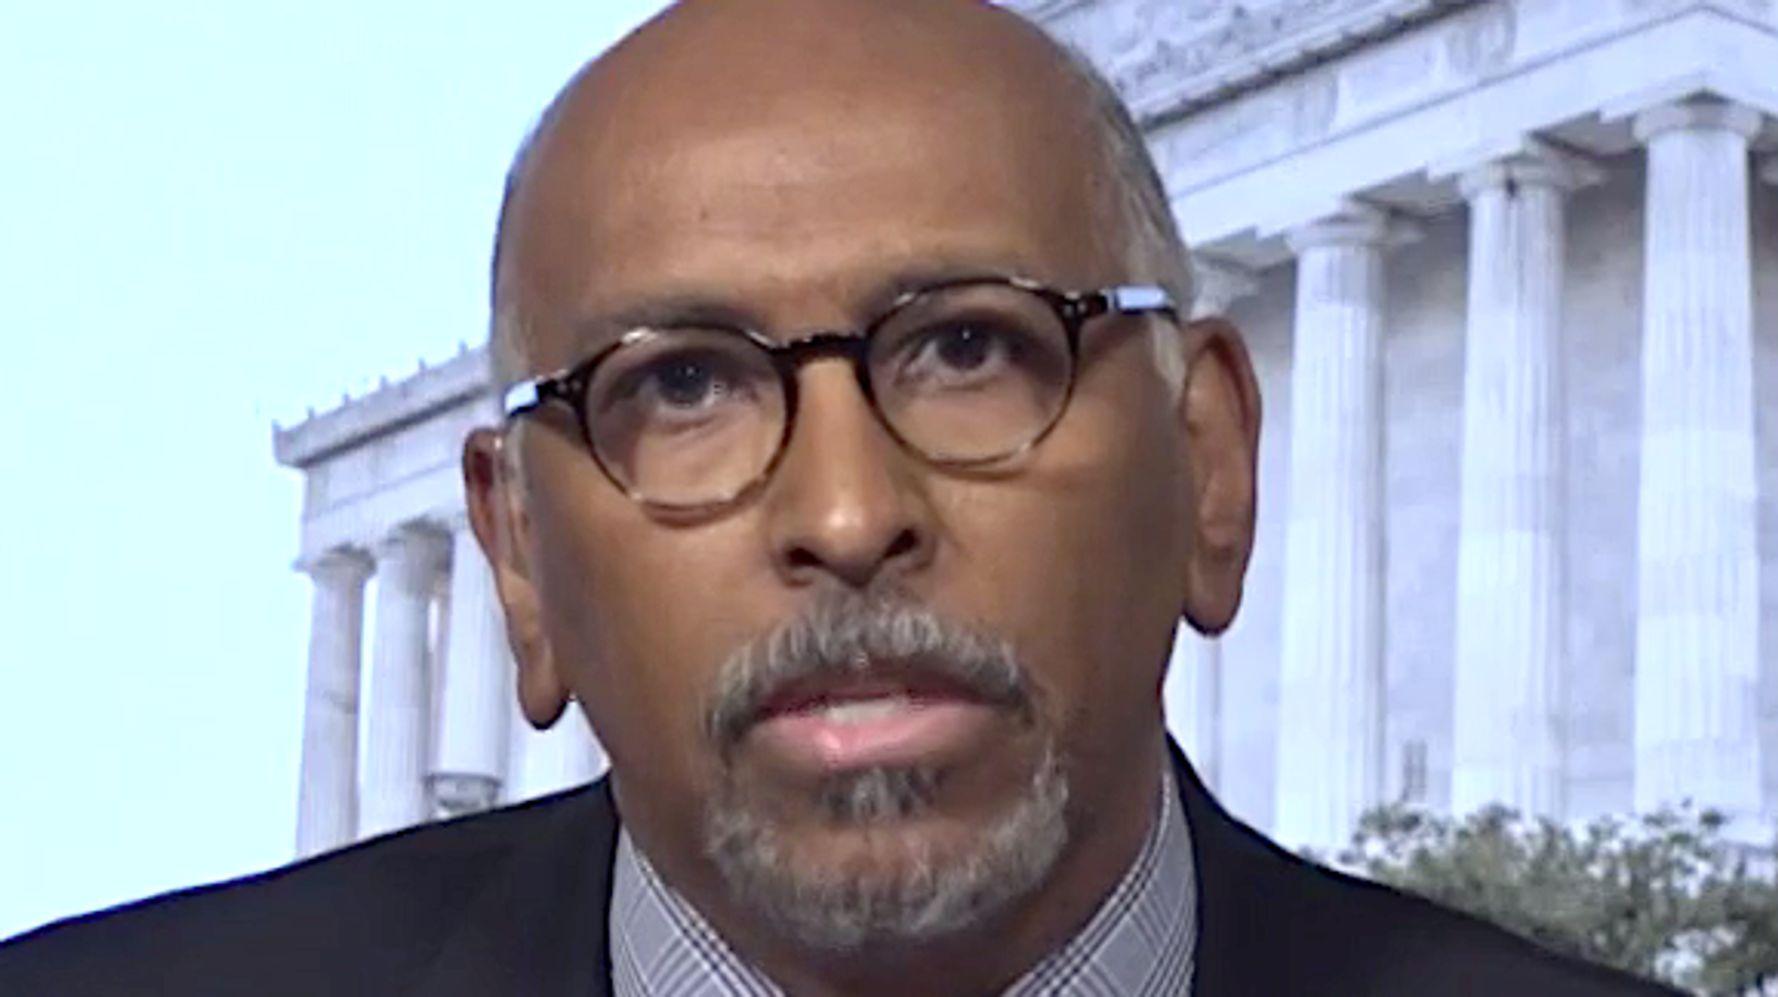 Westlake Legal Group 5e216ab222000052003f79a4 Ex-RNC Chair Exposes 'Un-American' Hypocrisy Of GOP Senators In Trump Senate Trial